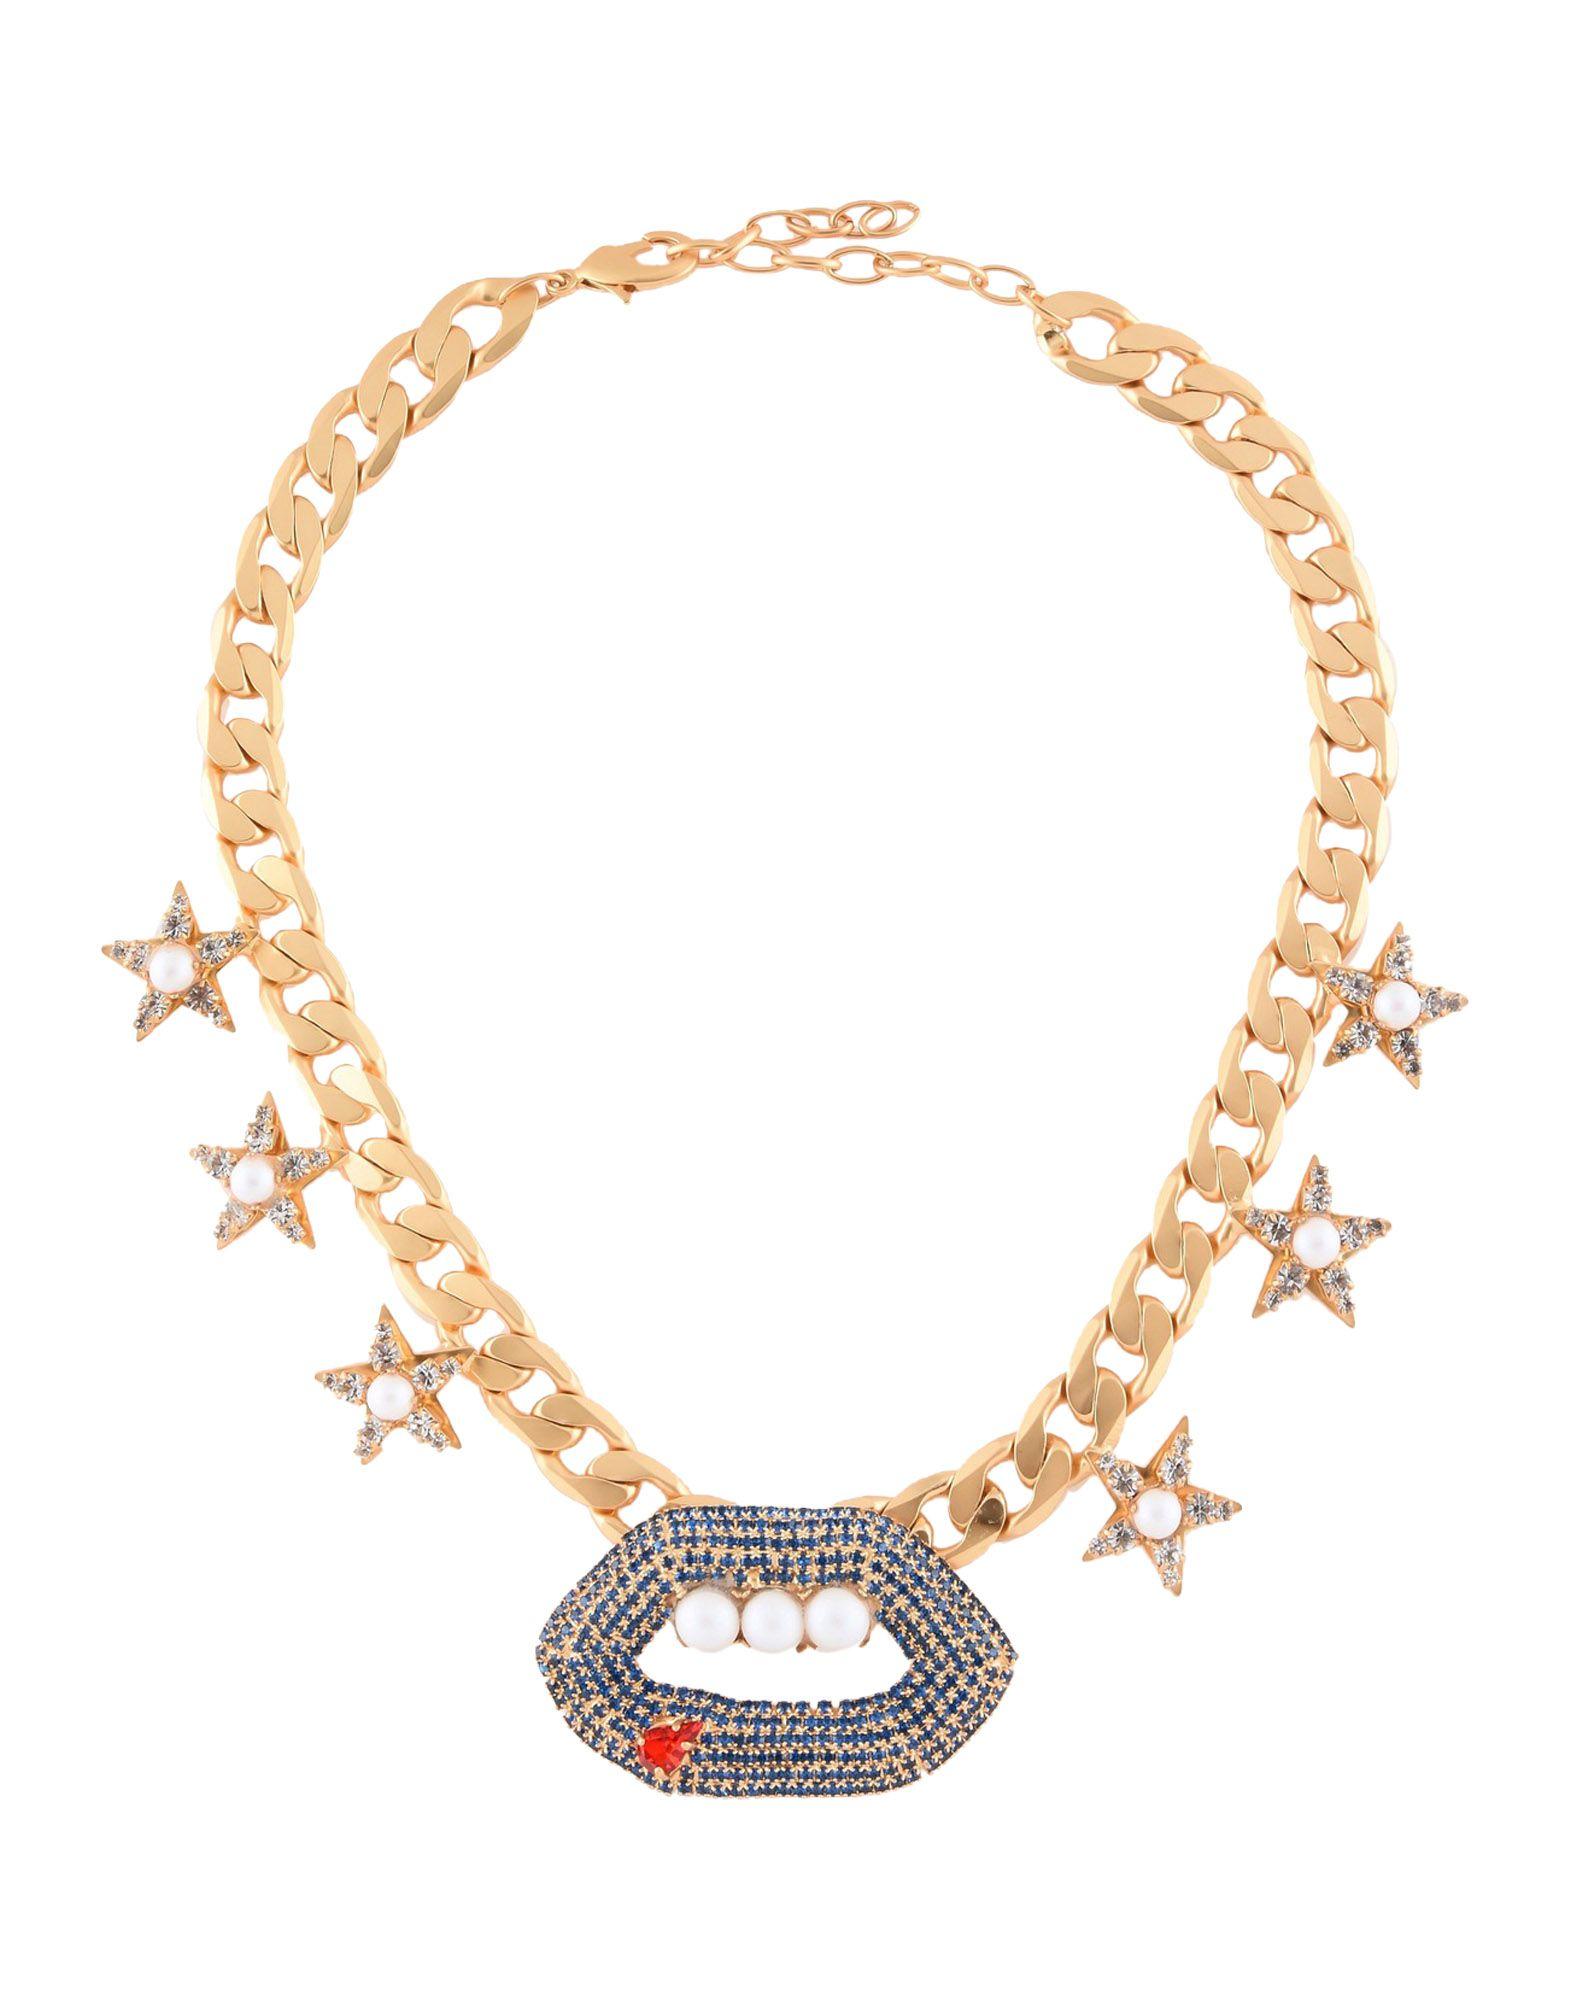 LISA C BIJOUX Necklace in Blue